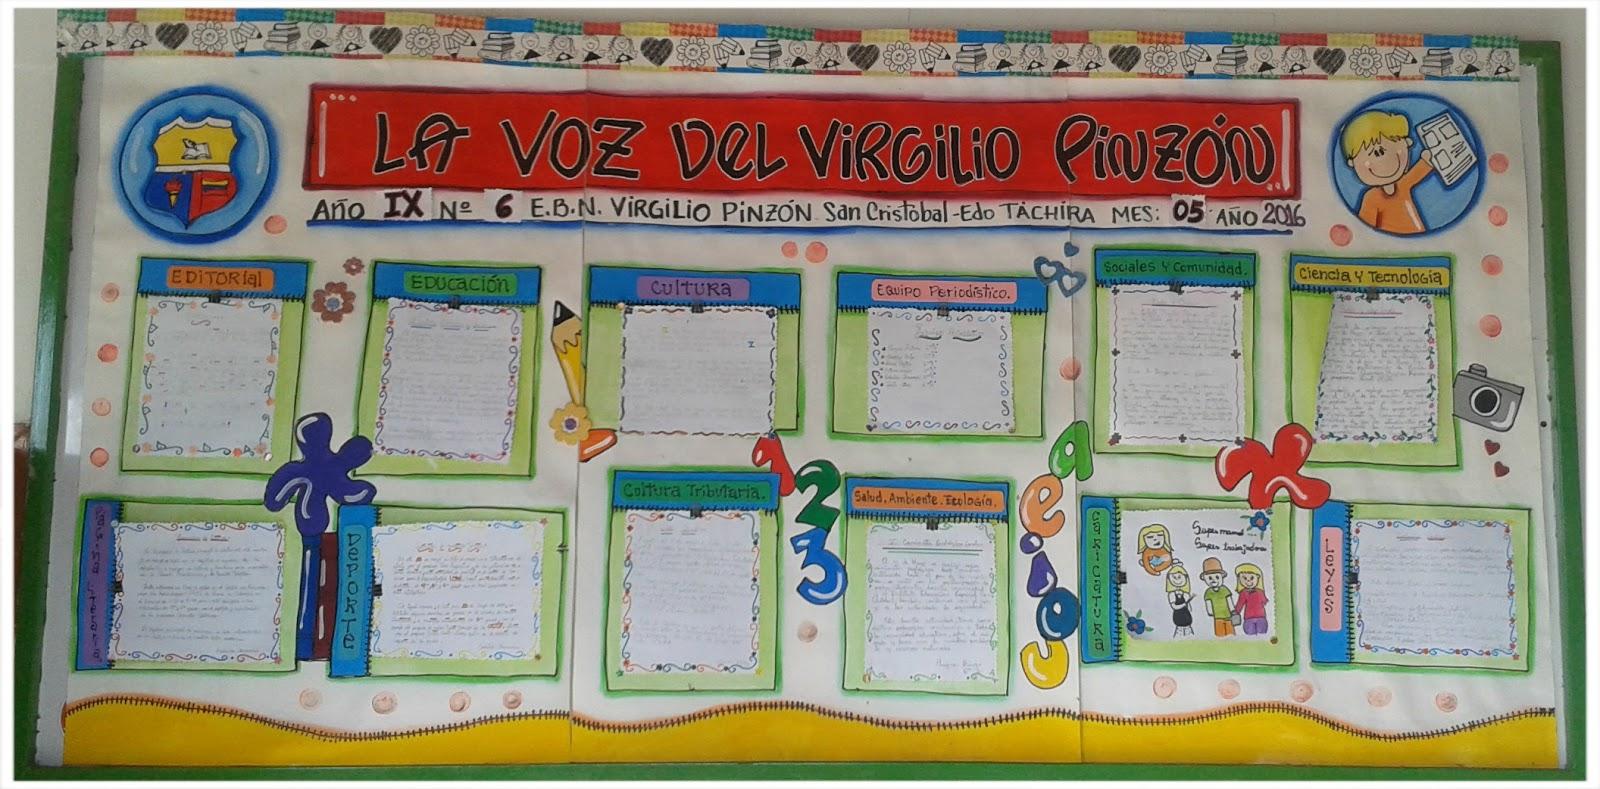 Escuela bolivariana virgilio pinz n peri dico mural for Editorial periodico mural